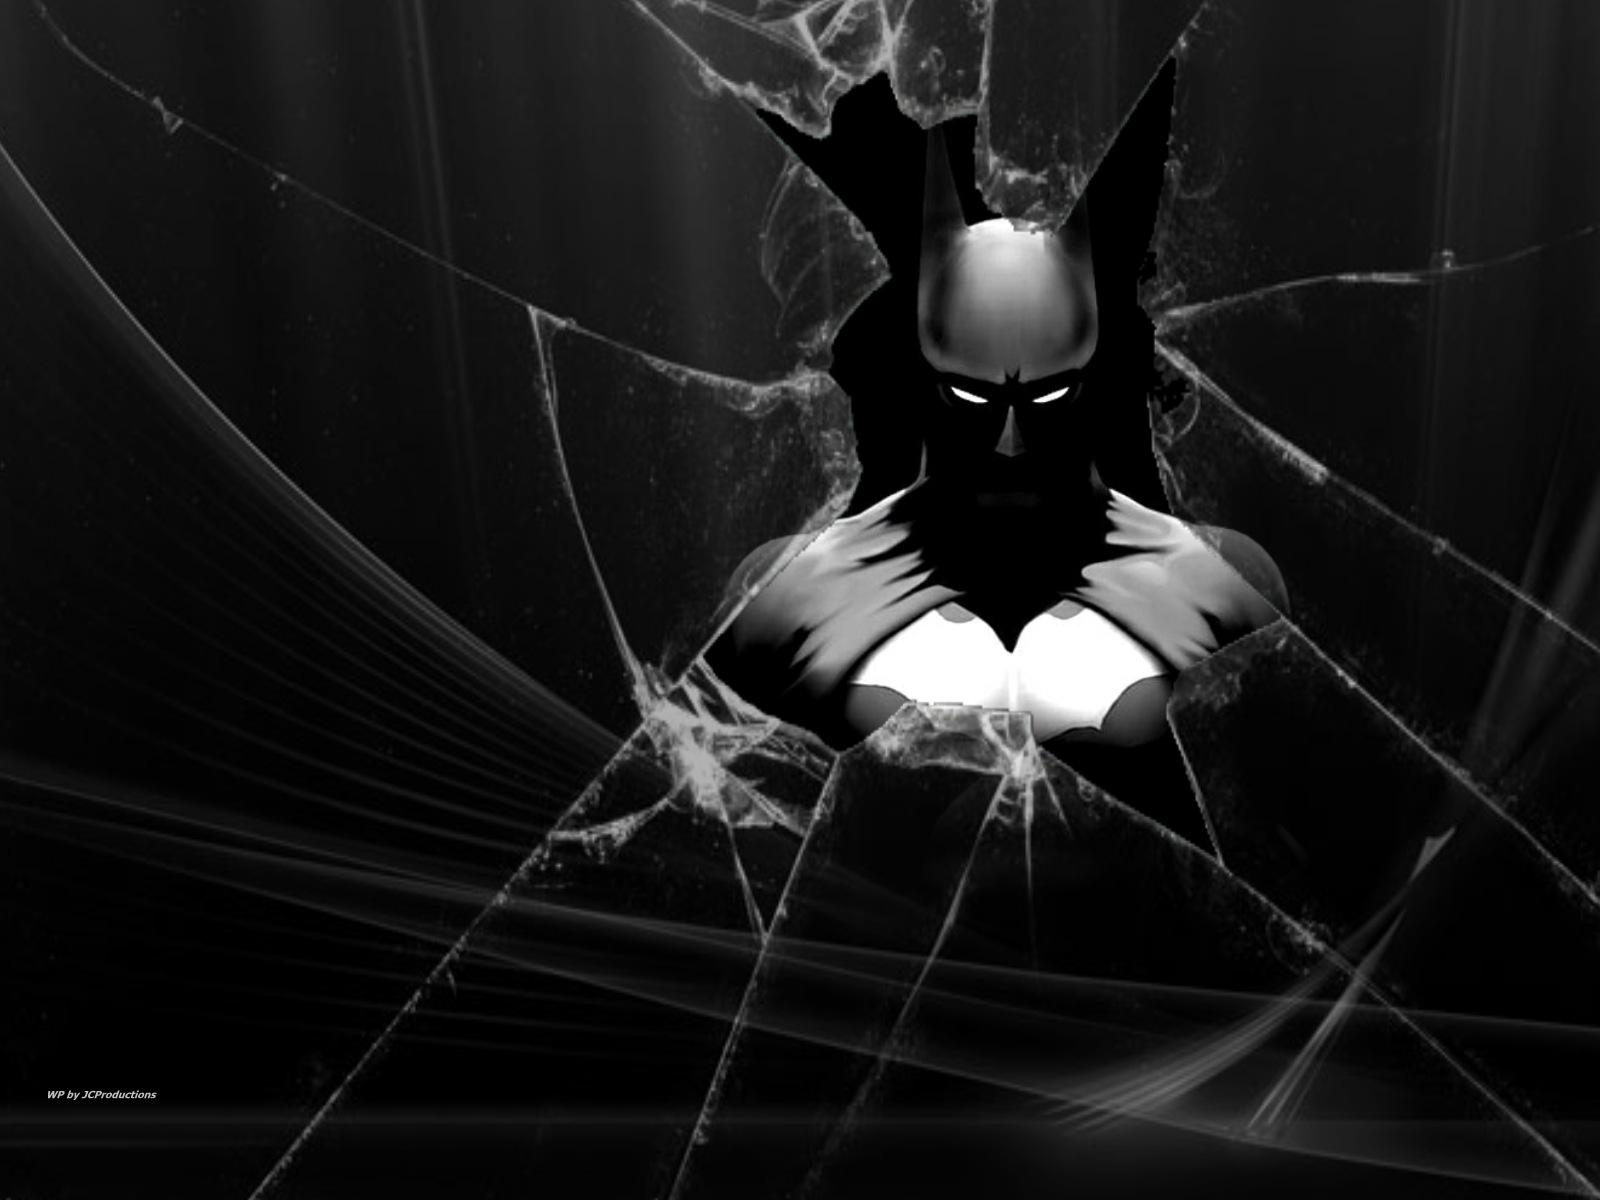 Batman images Batman HD wallpaper and background photos 1600x1200